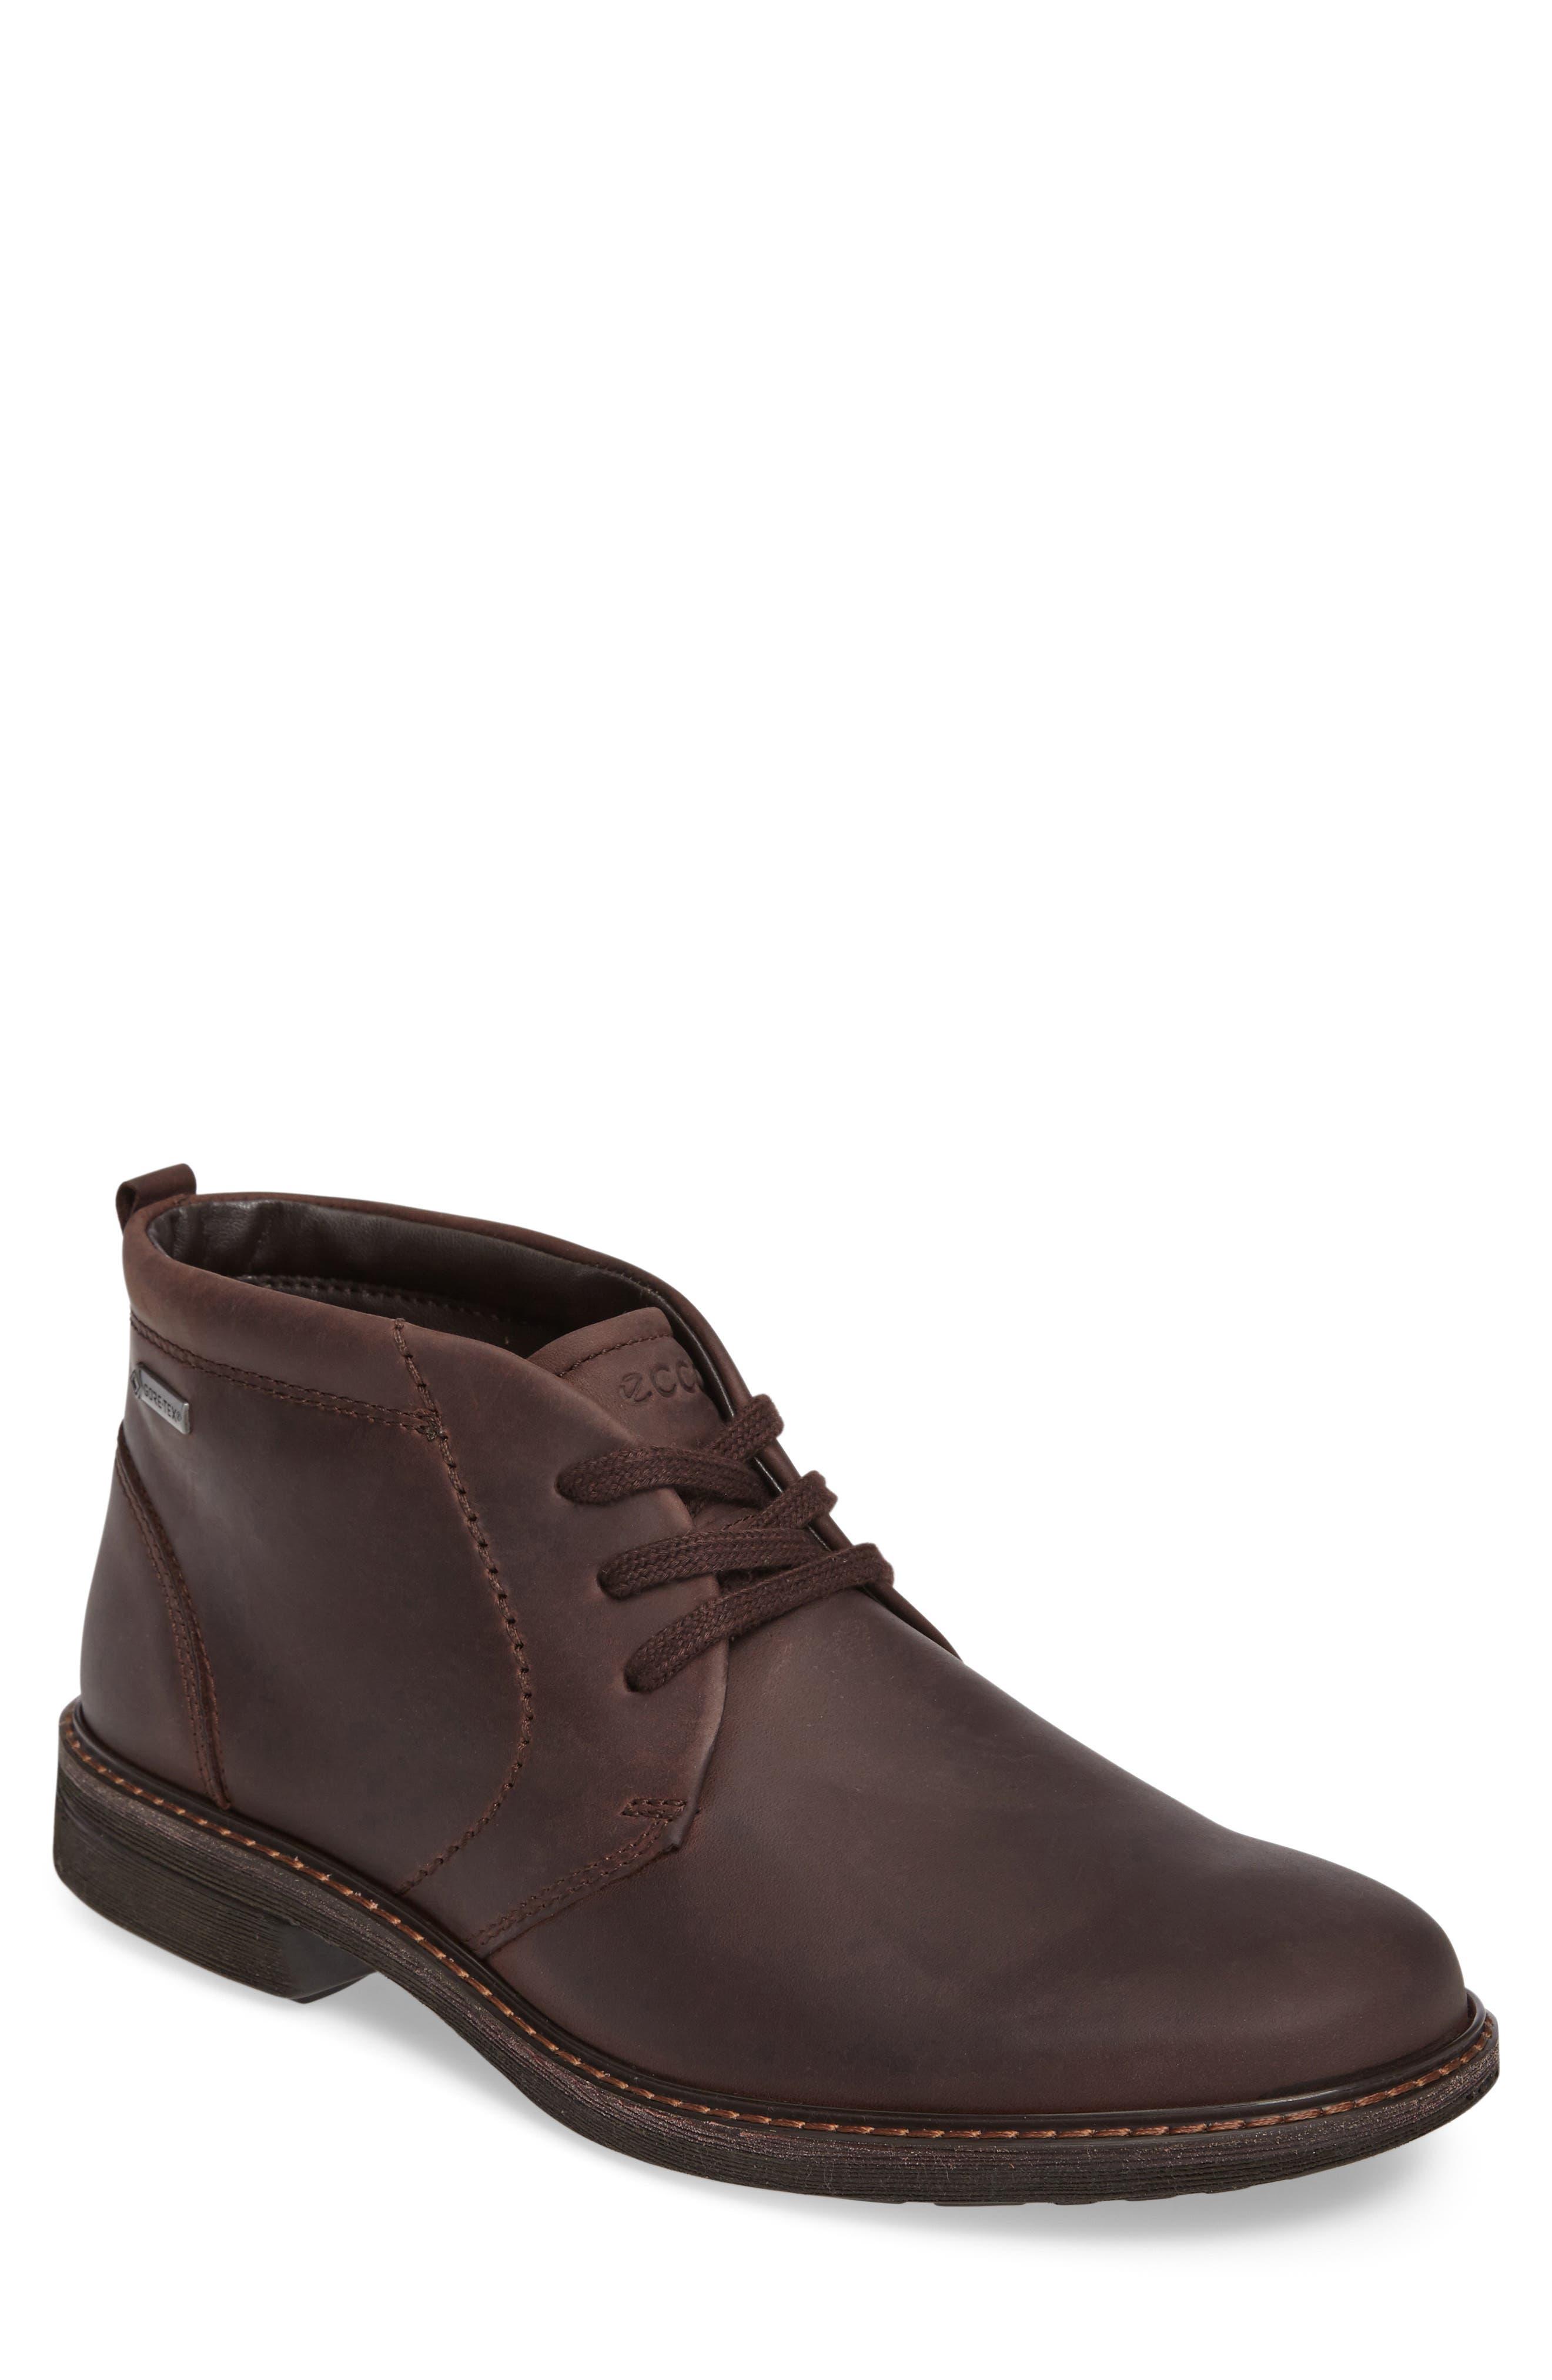 Turn Gore-Tex<sup>®</sup> Waterproof Chukka Boot,                         Main,                         color, Mocha Nubuck Leather